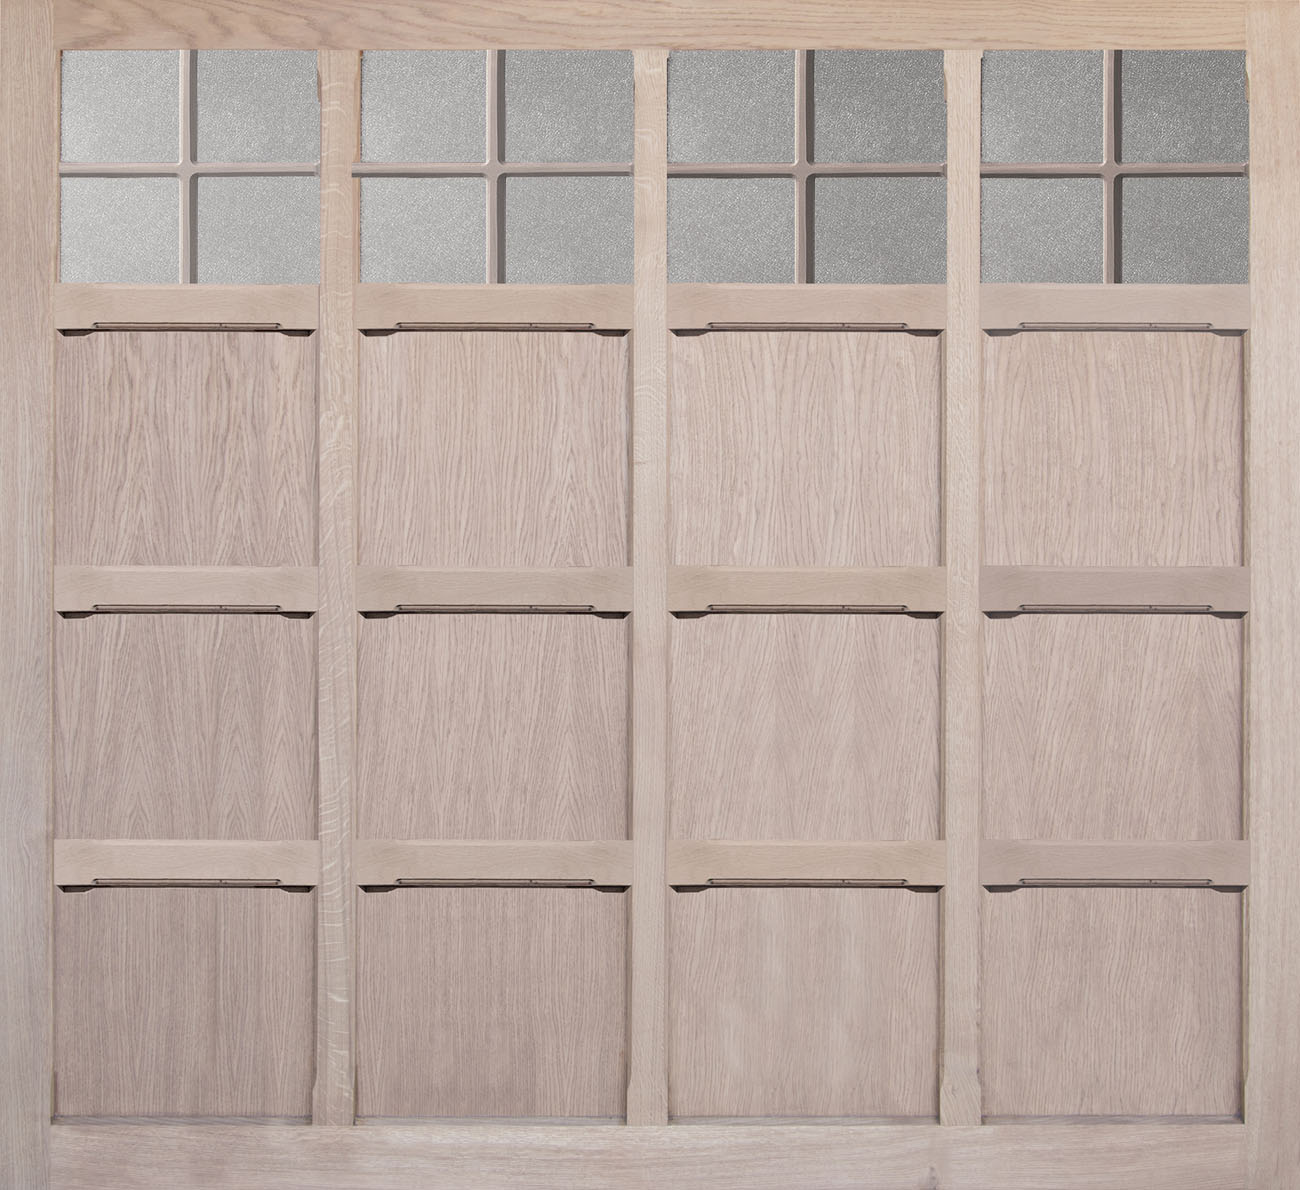 Oakgrove panel-built